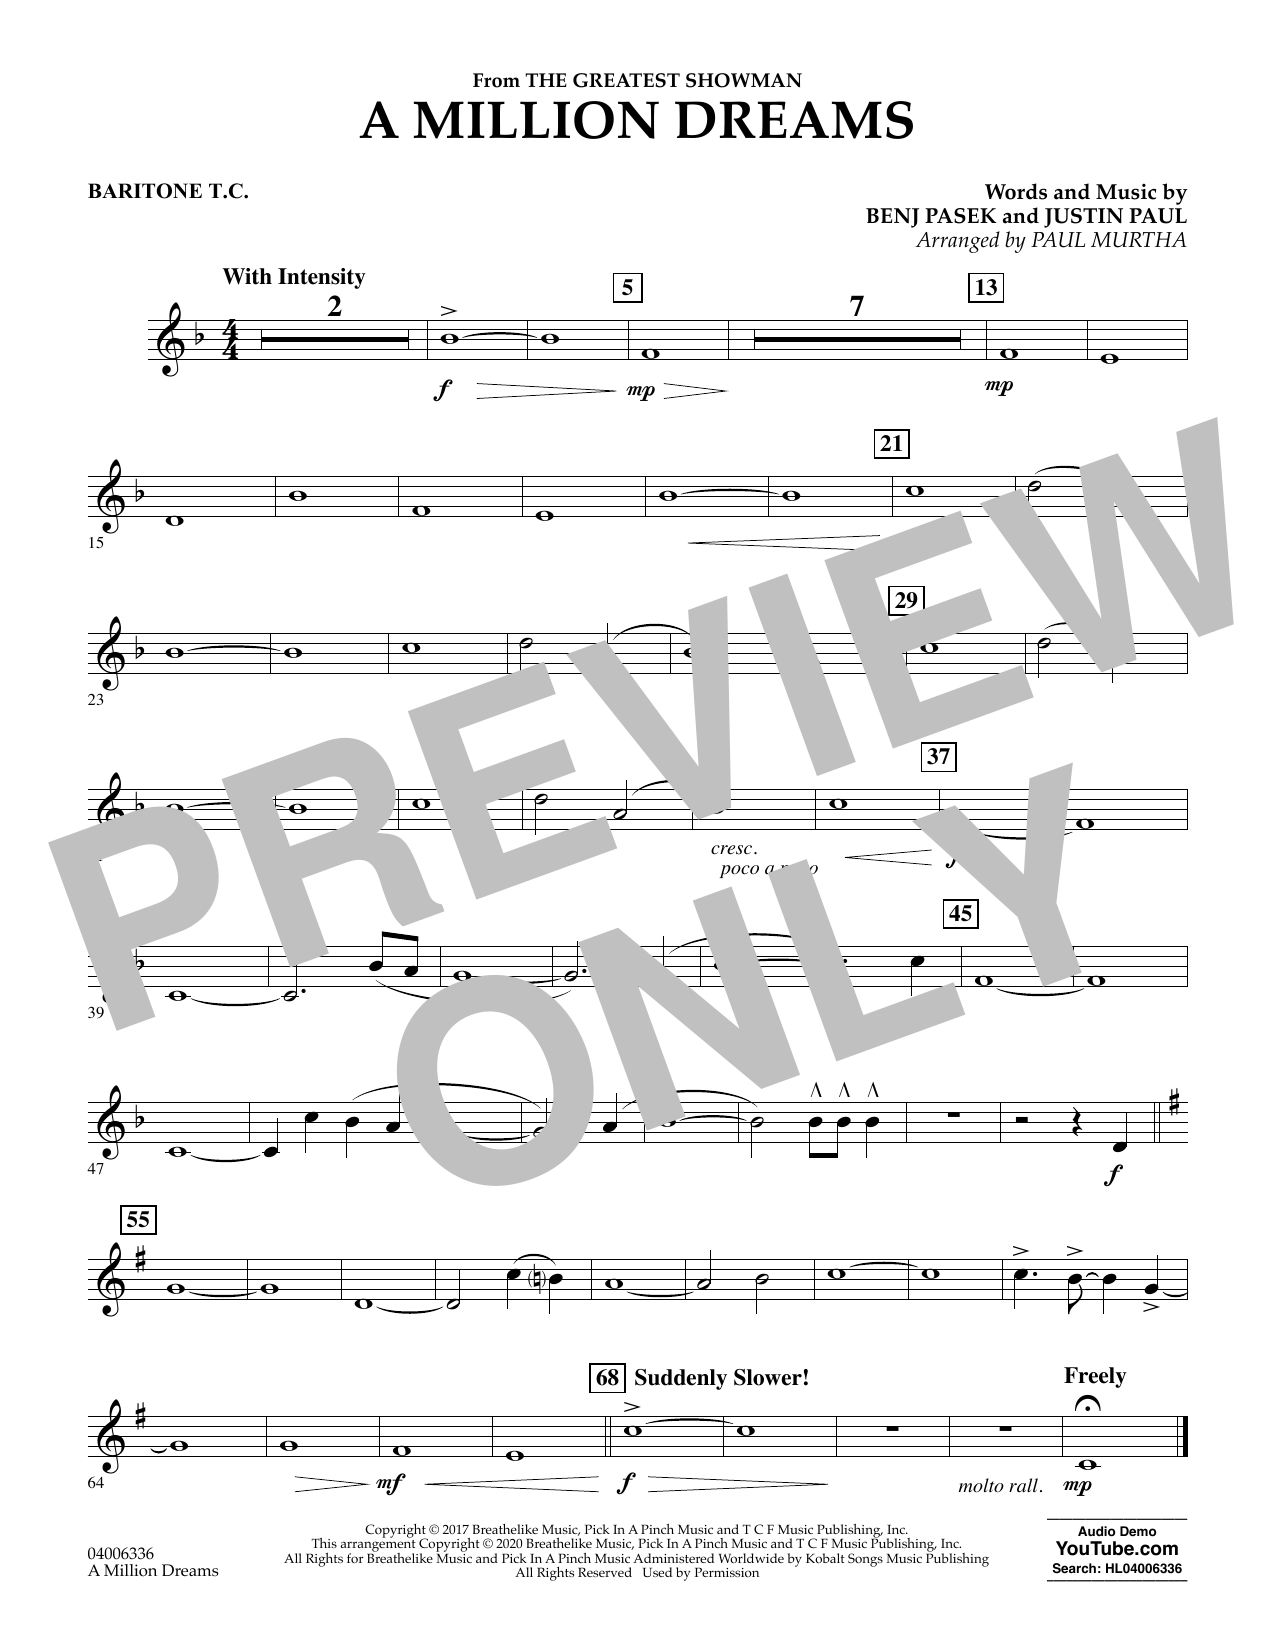 A Million Dreams (from The Greatest Showman) (arr. Paul Murtha) - Baritone T.C. (Concert Band)